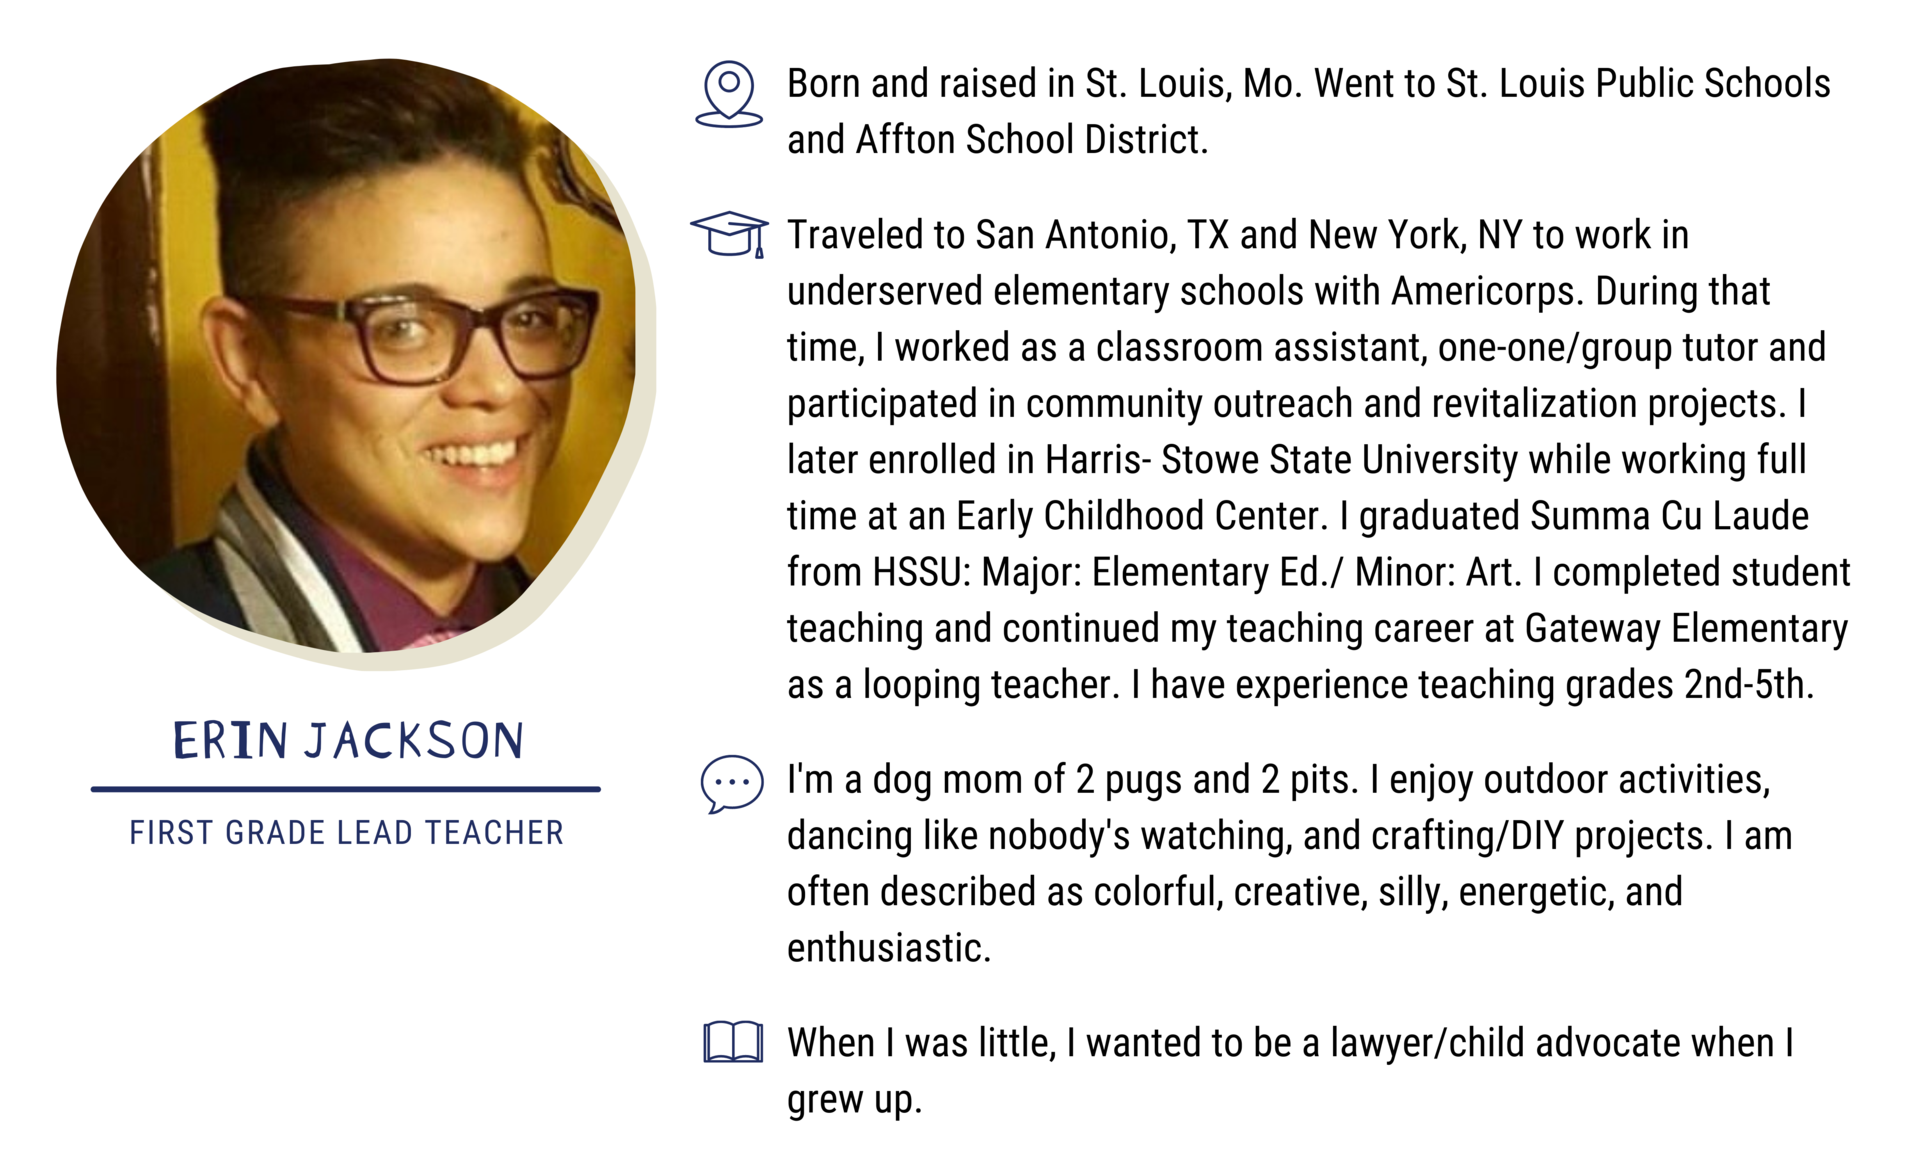 Erin Jackson, First Grade Lead